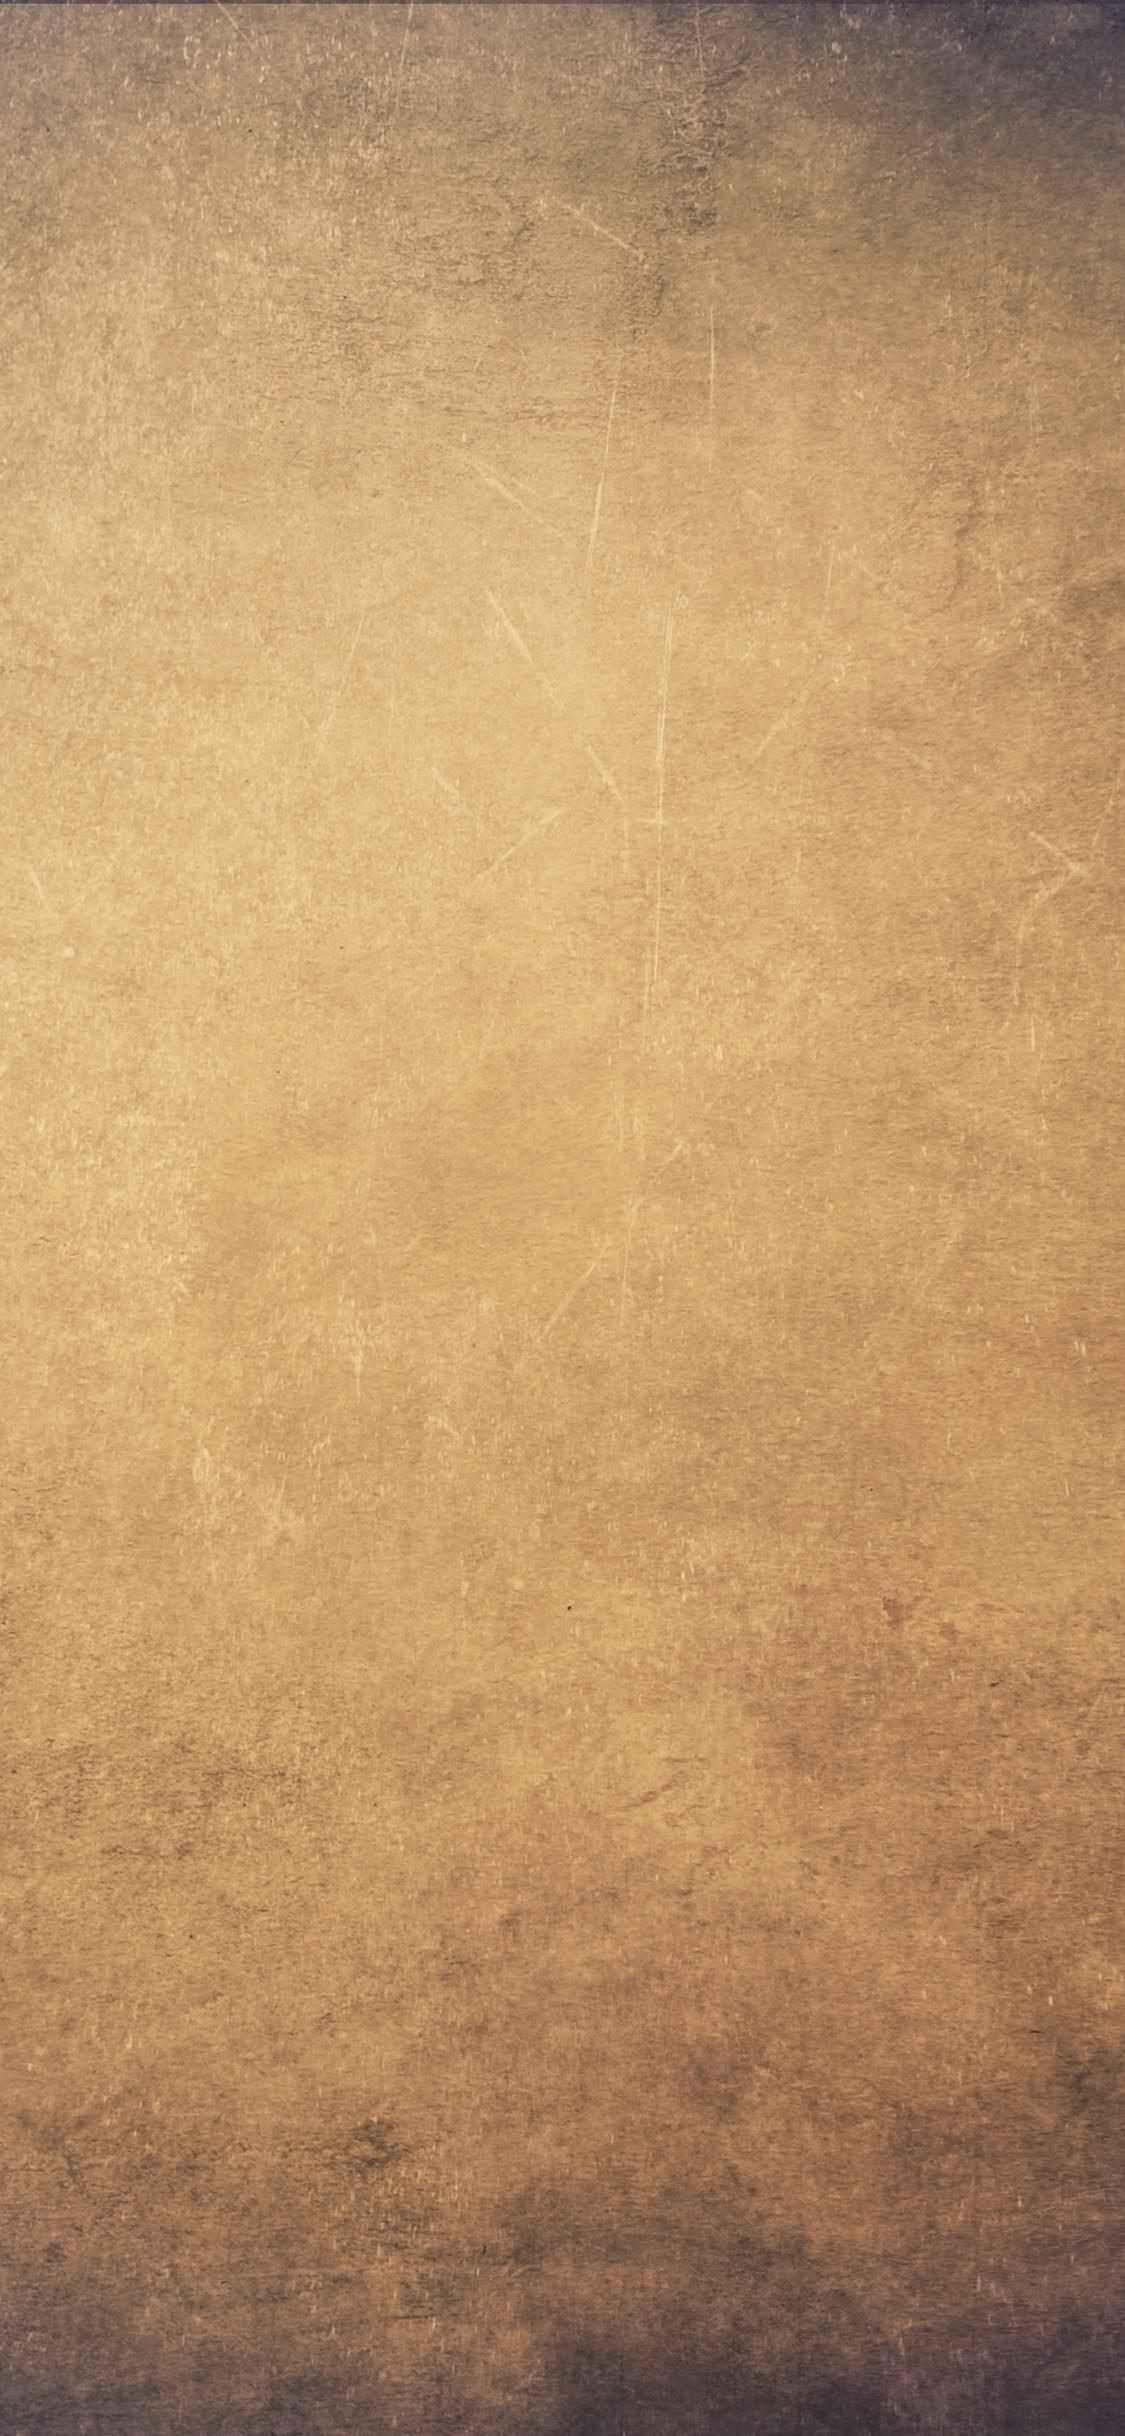 iPhone X 壁紙 wallpaper 0706